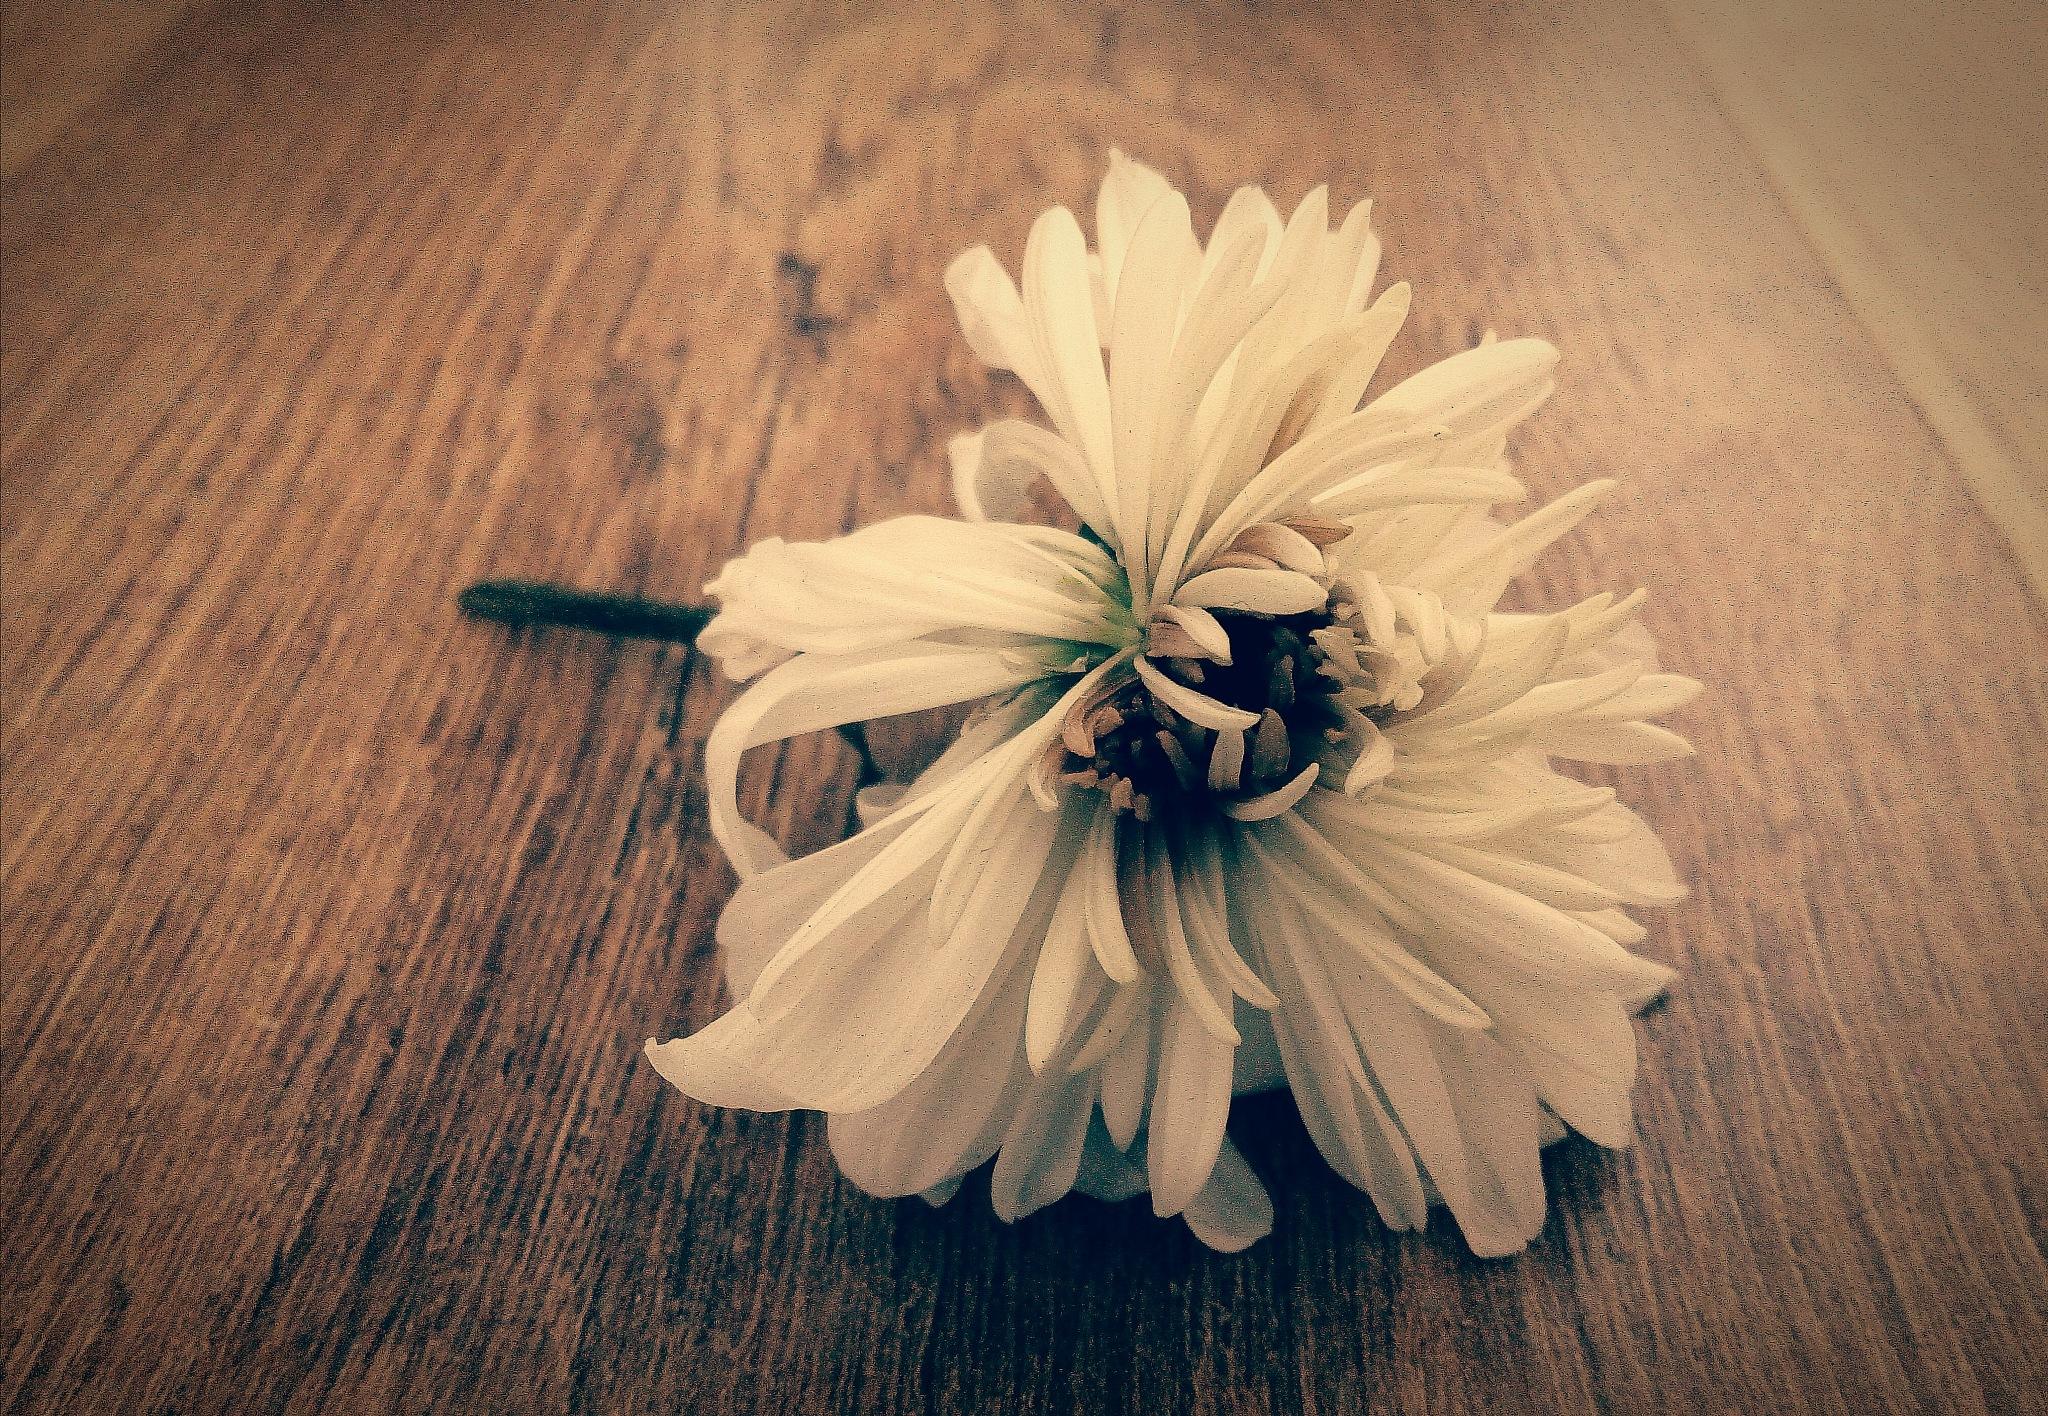 life fading away by jassaj